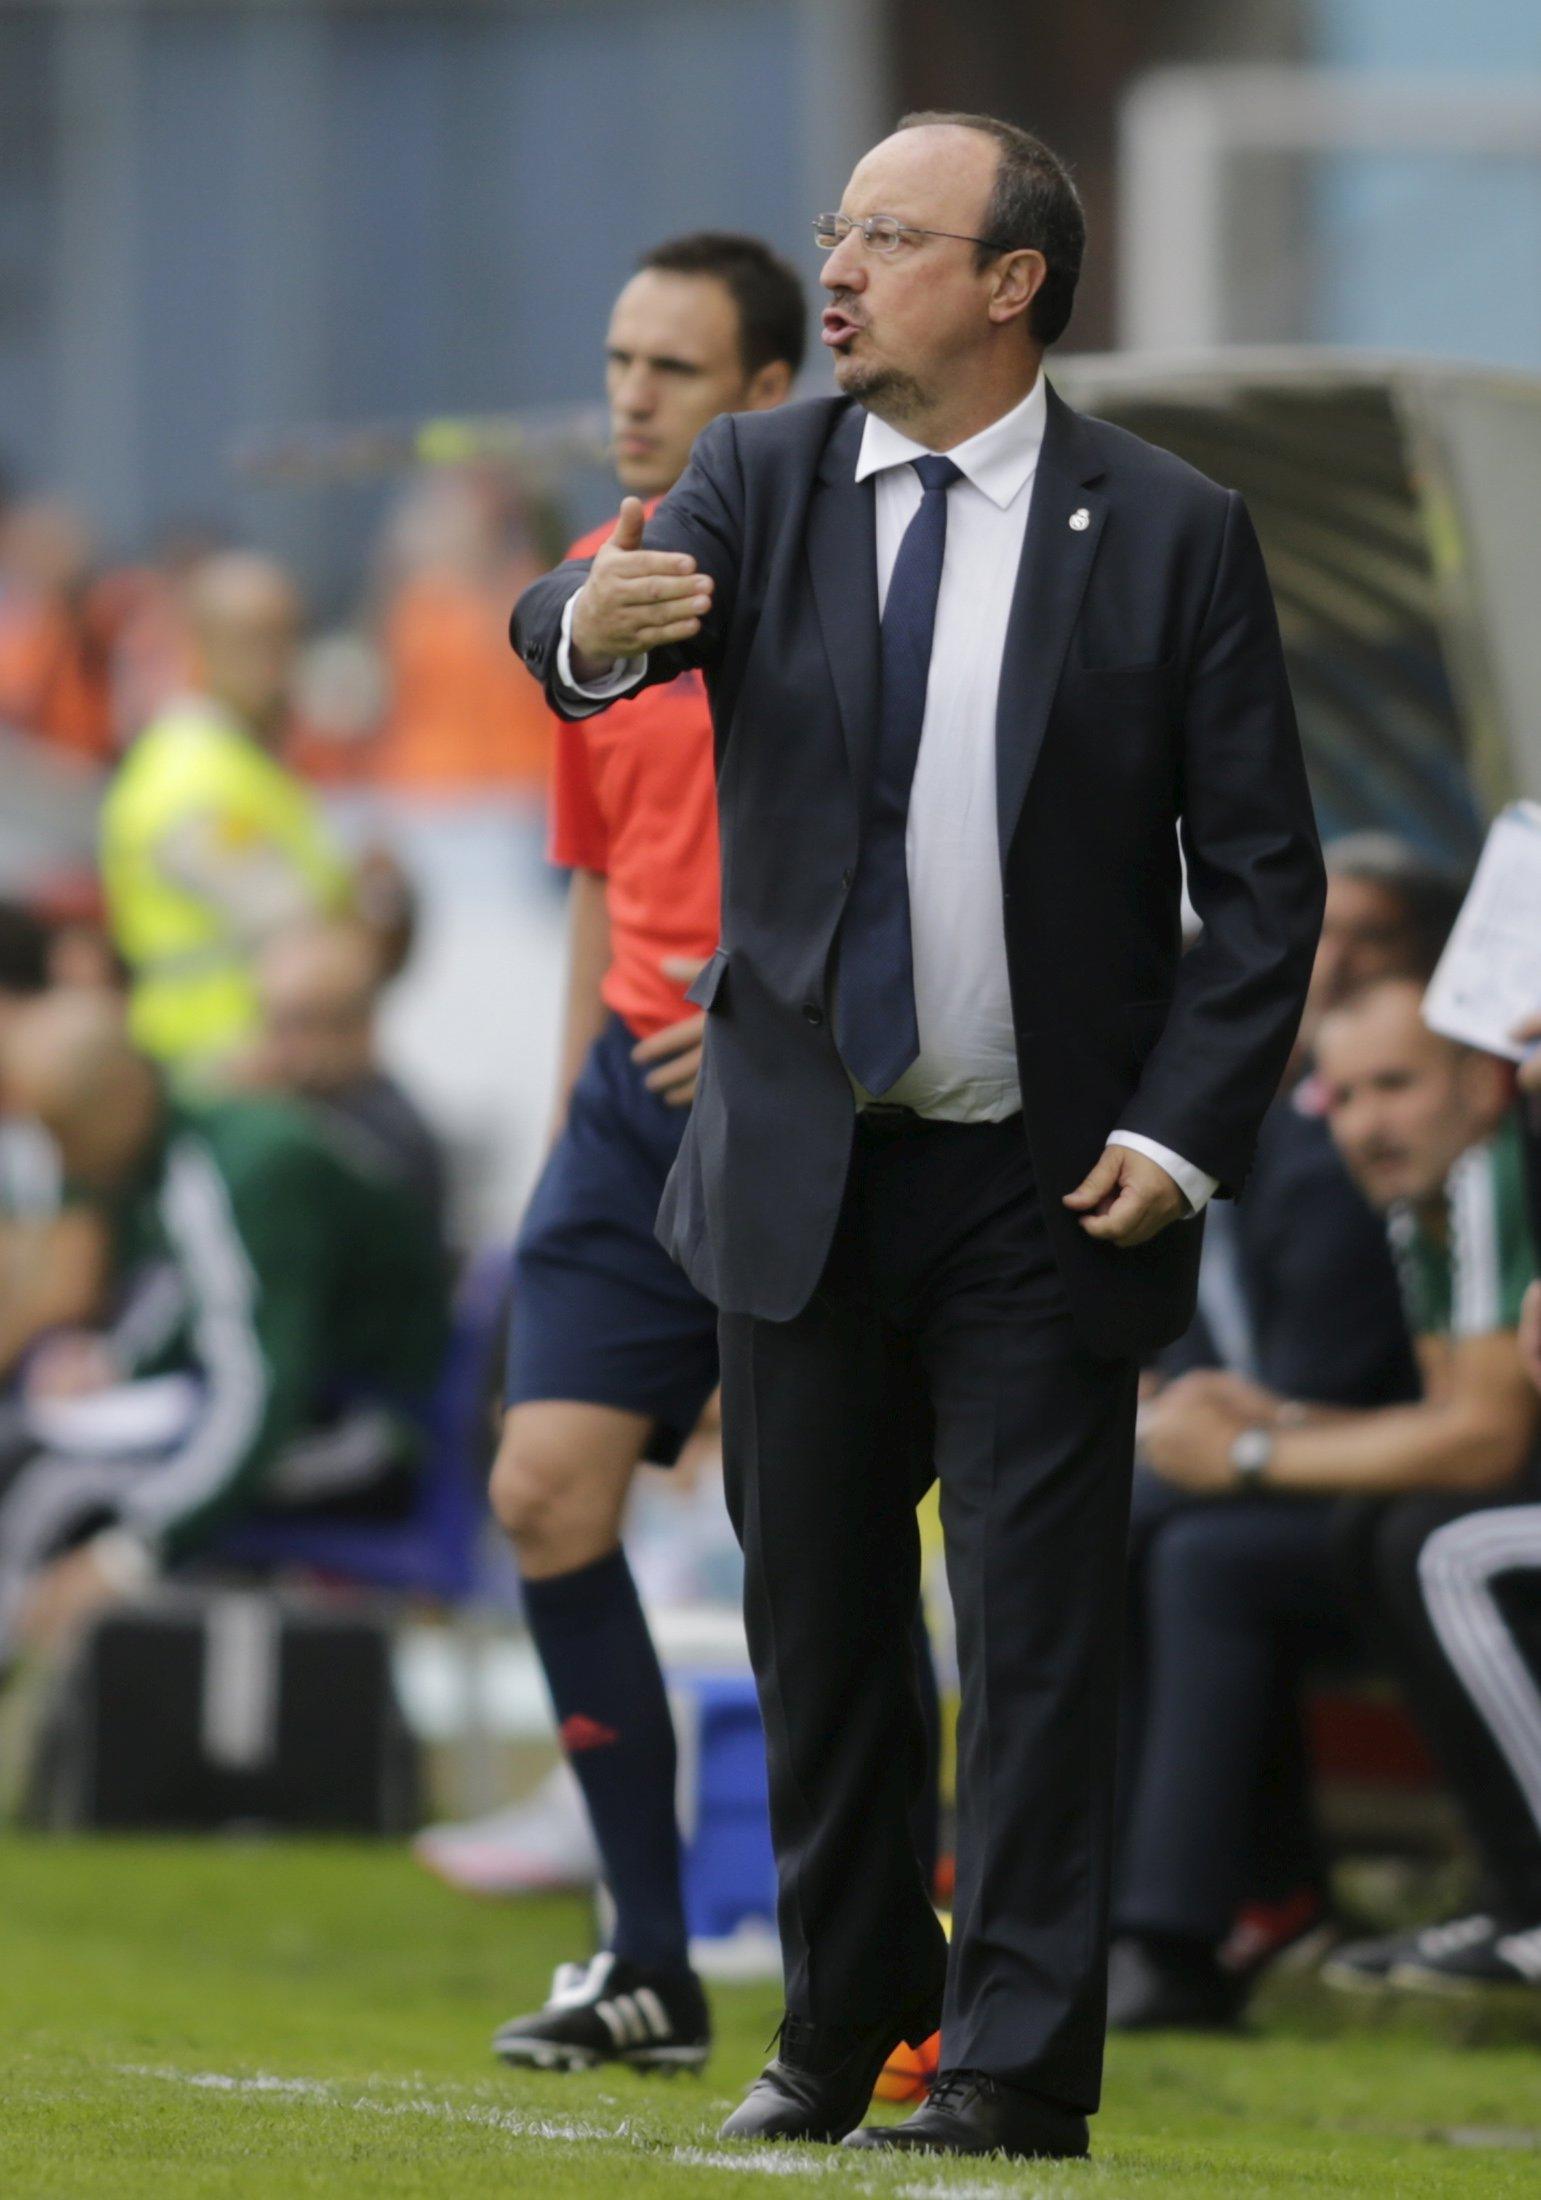 Real Madrid's coach Rafa Benitez reacts during their Spanish first division soccer match against Celta Vigo at Balaidos stadium in Vigo, Spain October 24, 2015. REUTERS/Miguel Vidal